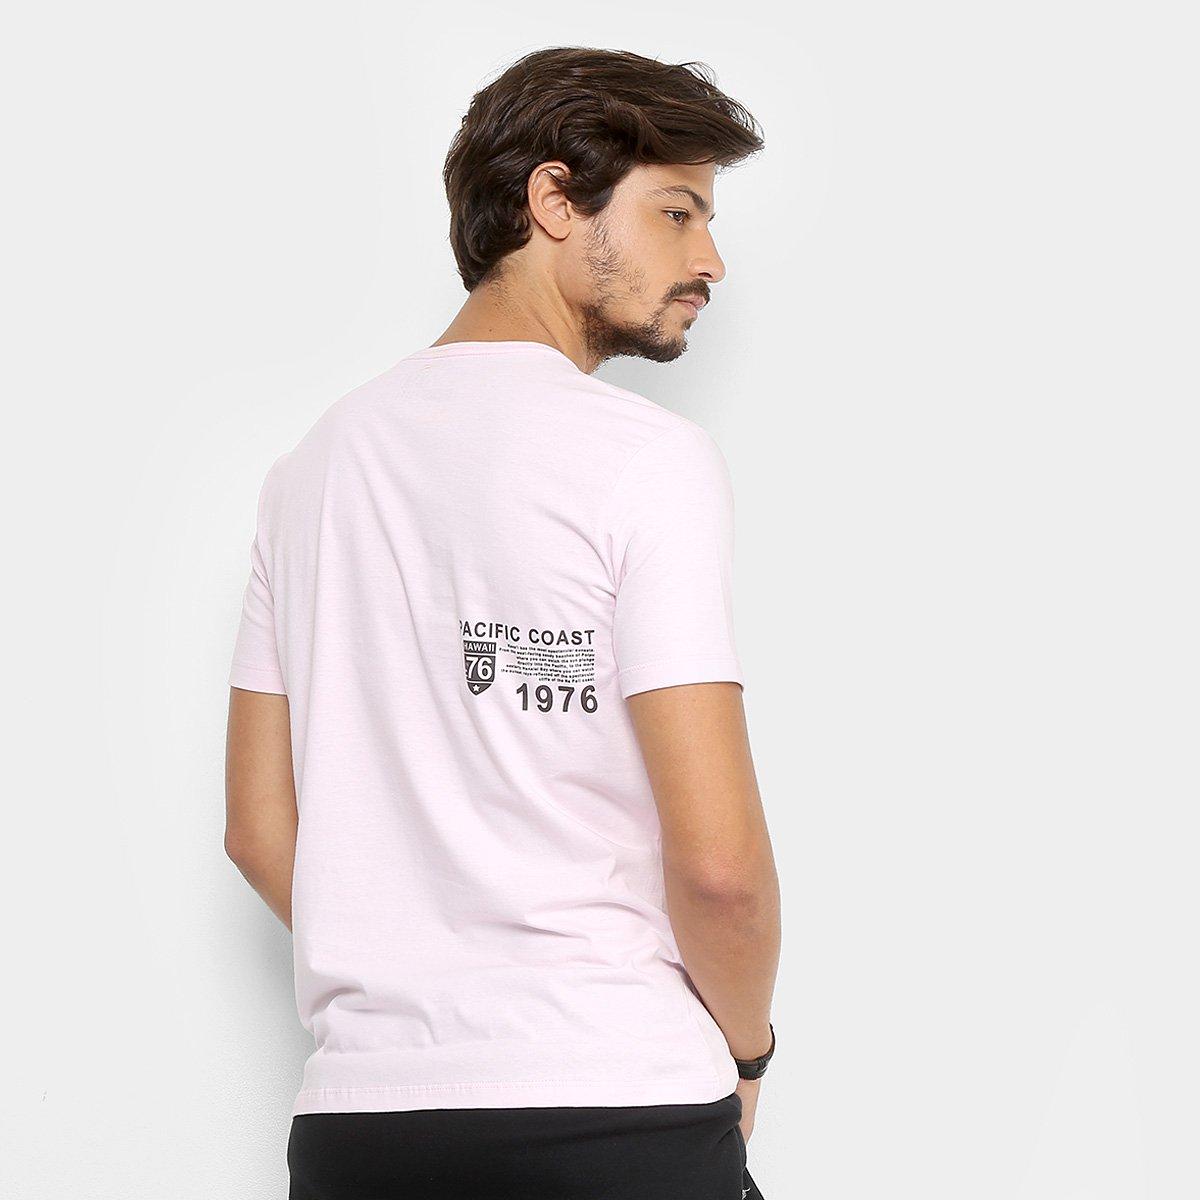 3d980f54b312a Camiseta Kohmar Estampada Wave Rider Masculina - Compre Agora   Netshoes